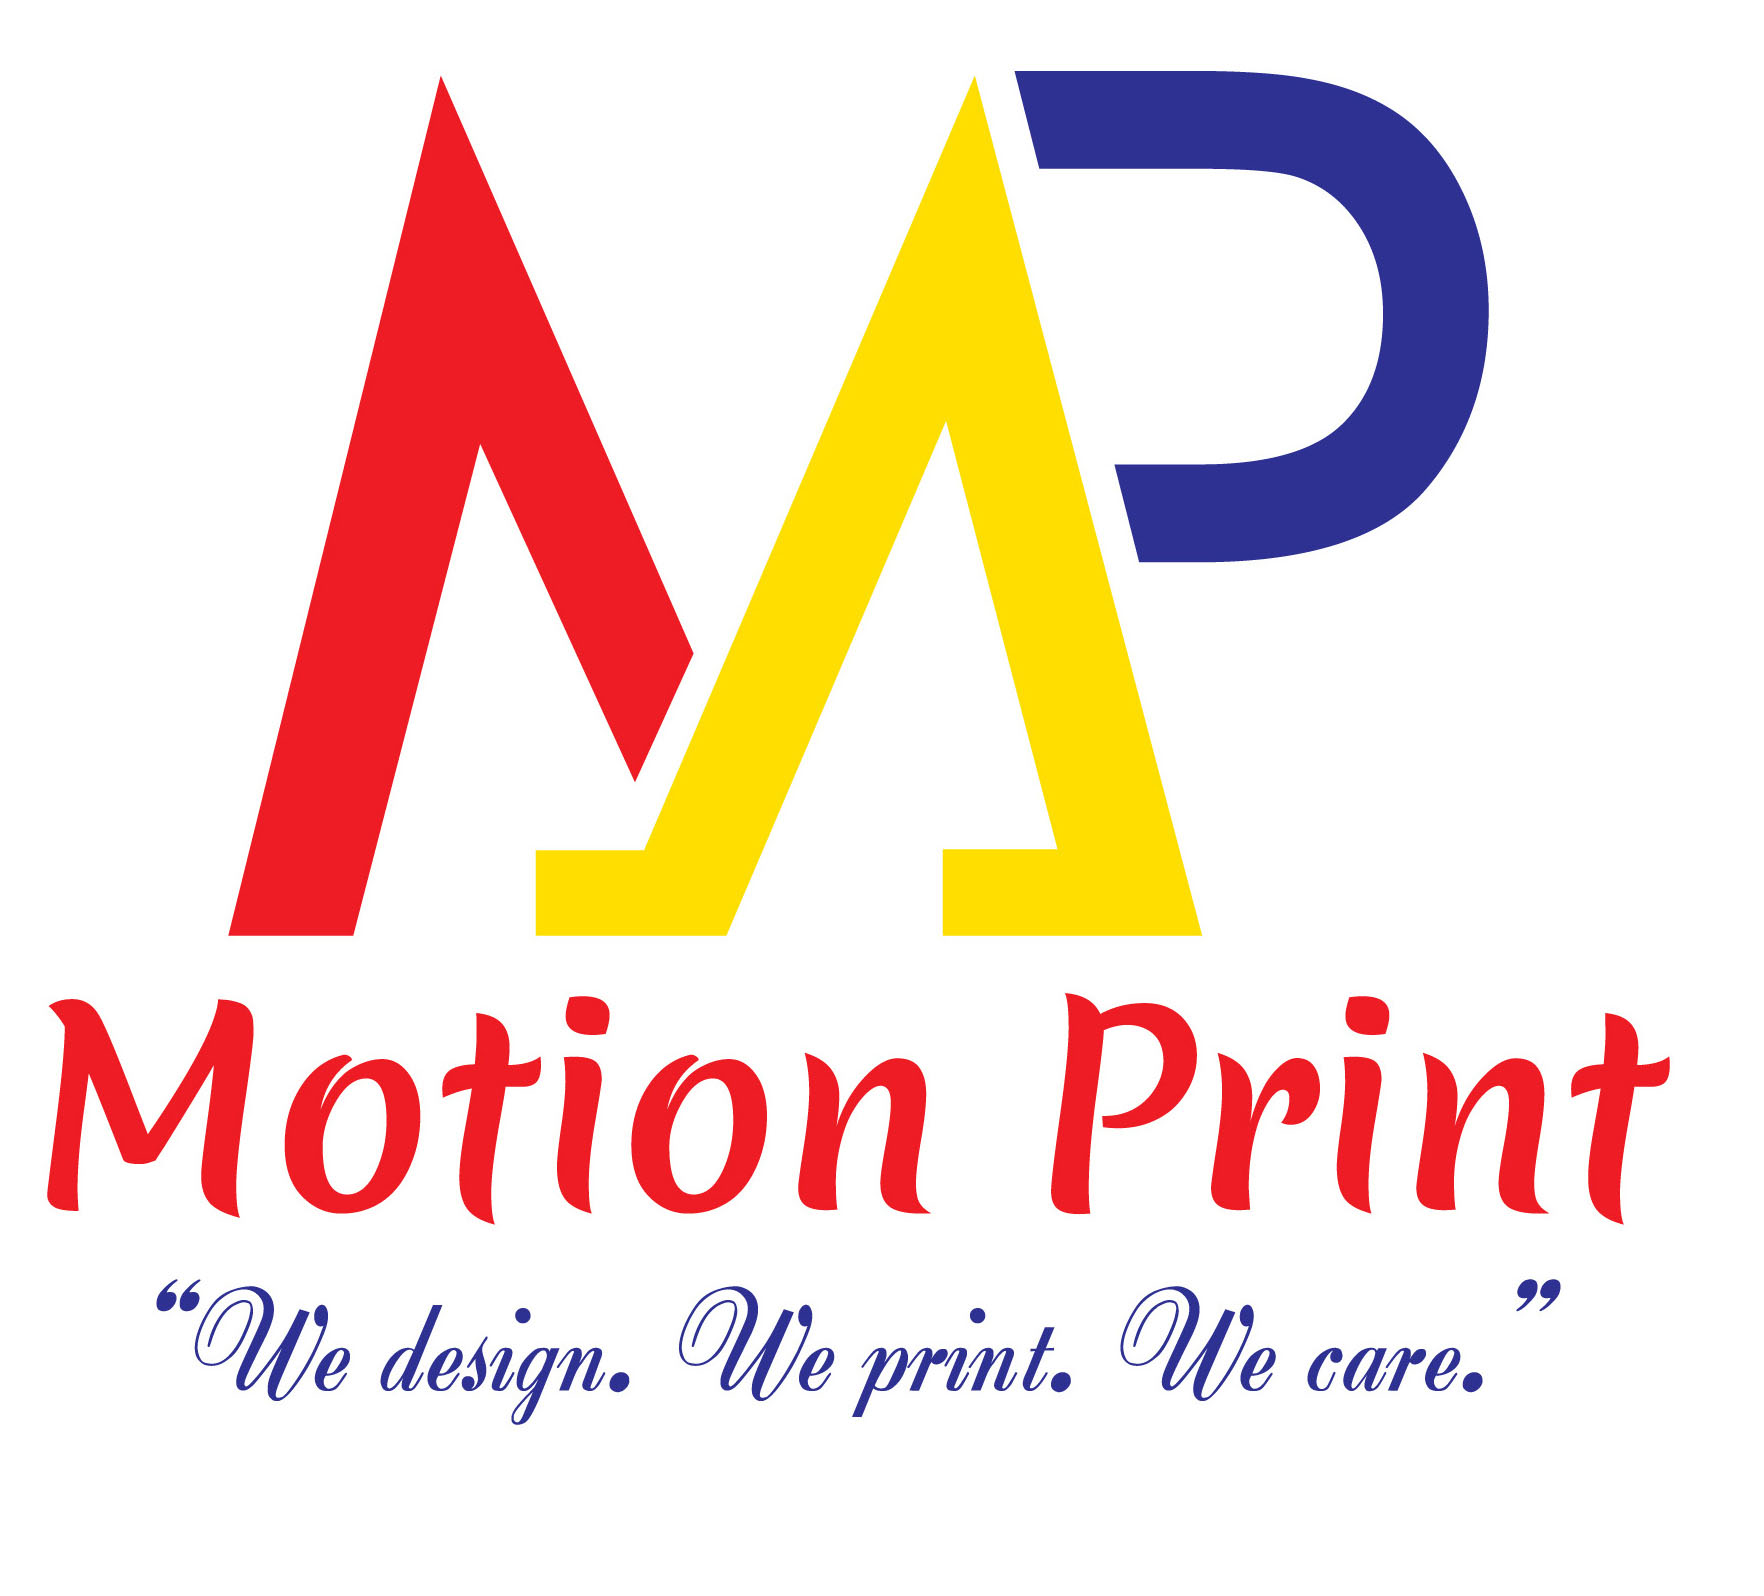 Motion Print